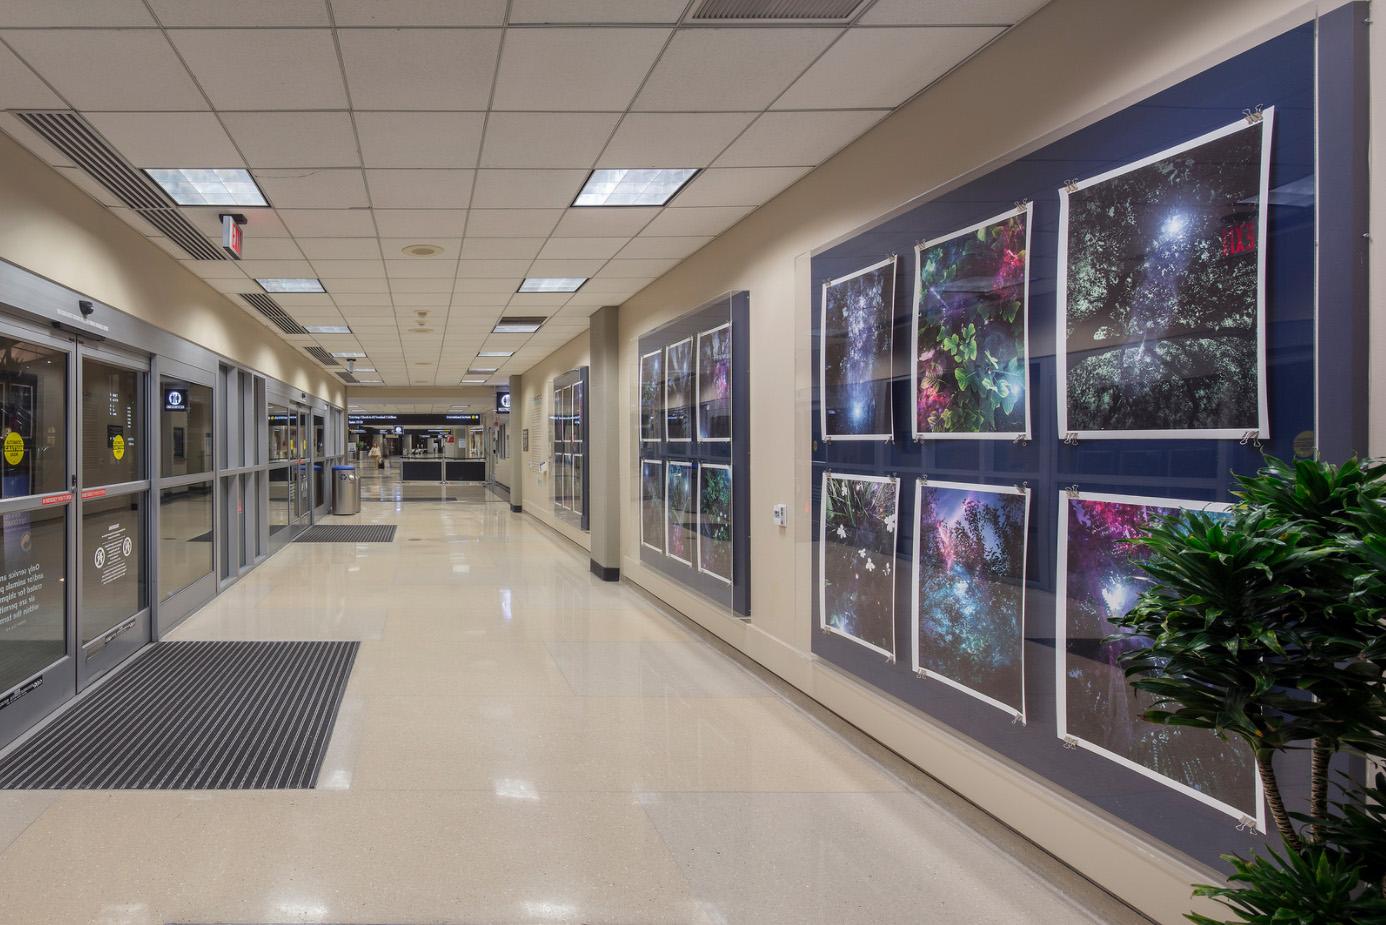 "Installation View / Terminal 2 / San Diego International Airport Plexiglass Containers 7x7' each image 20x30"""